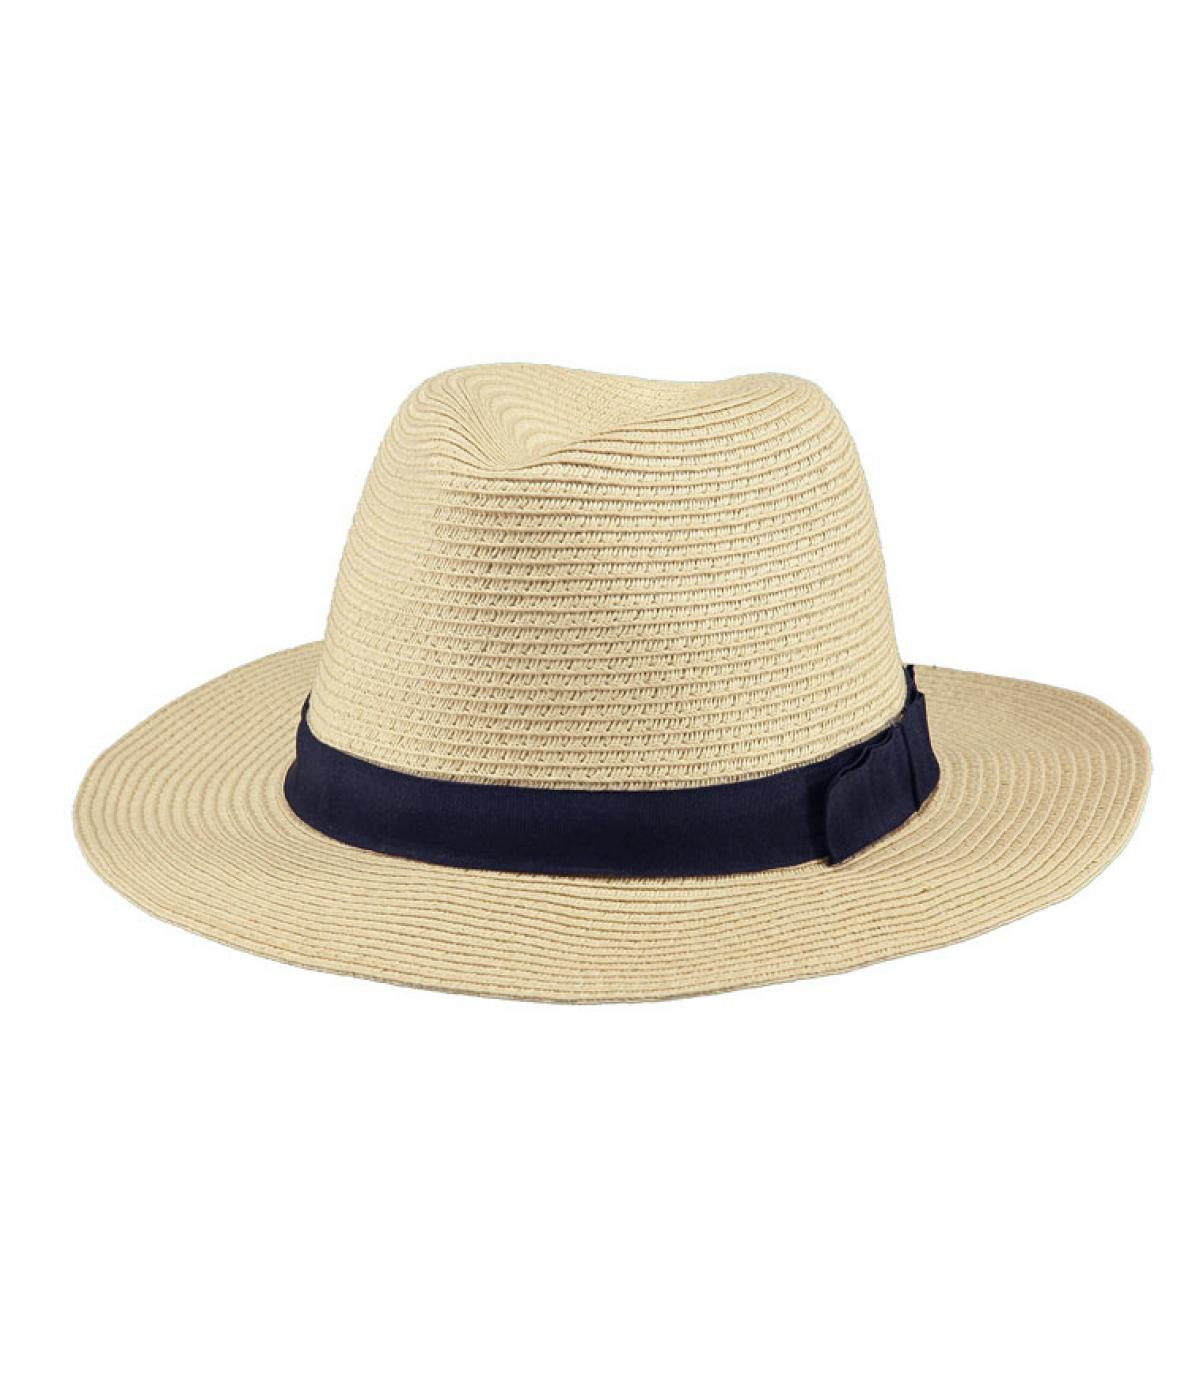 Sombrero paja beige cinta azul